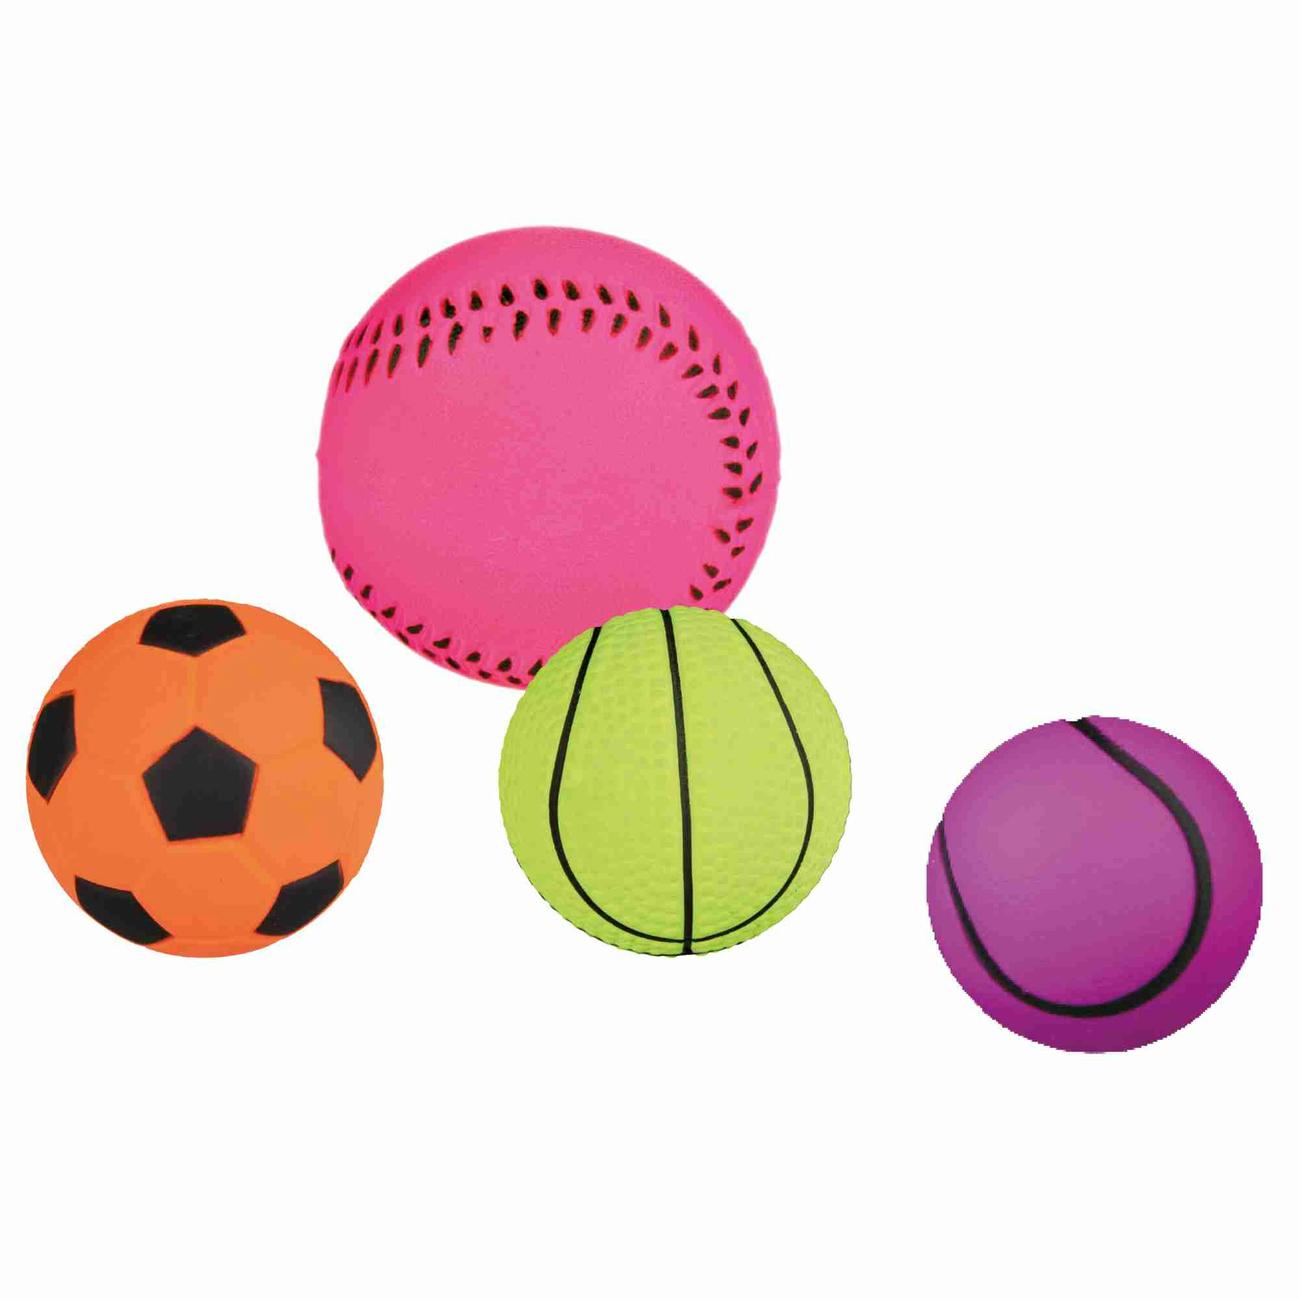 TRIXIE Hundeball Spielball aus Moosgummi 6 cm 3443